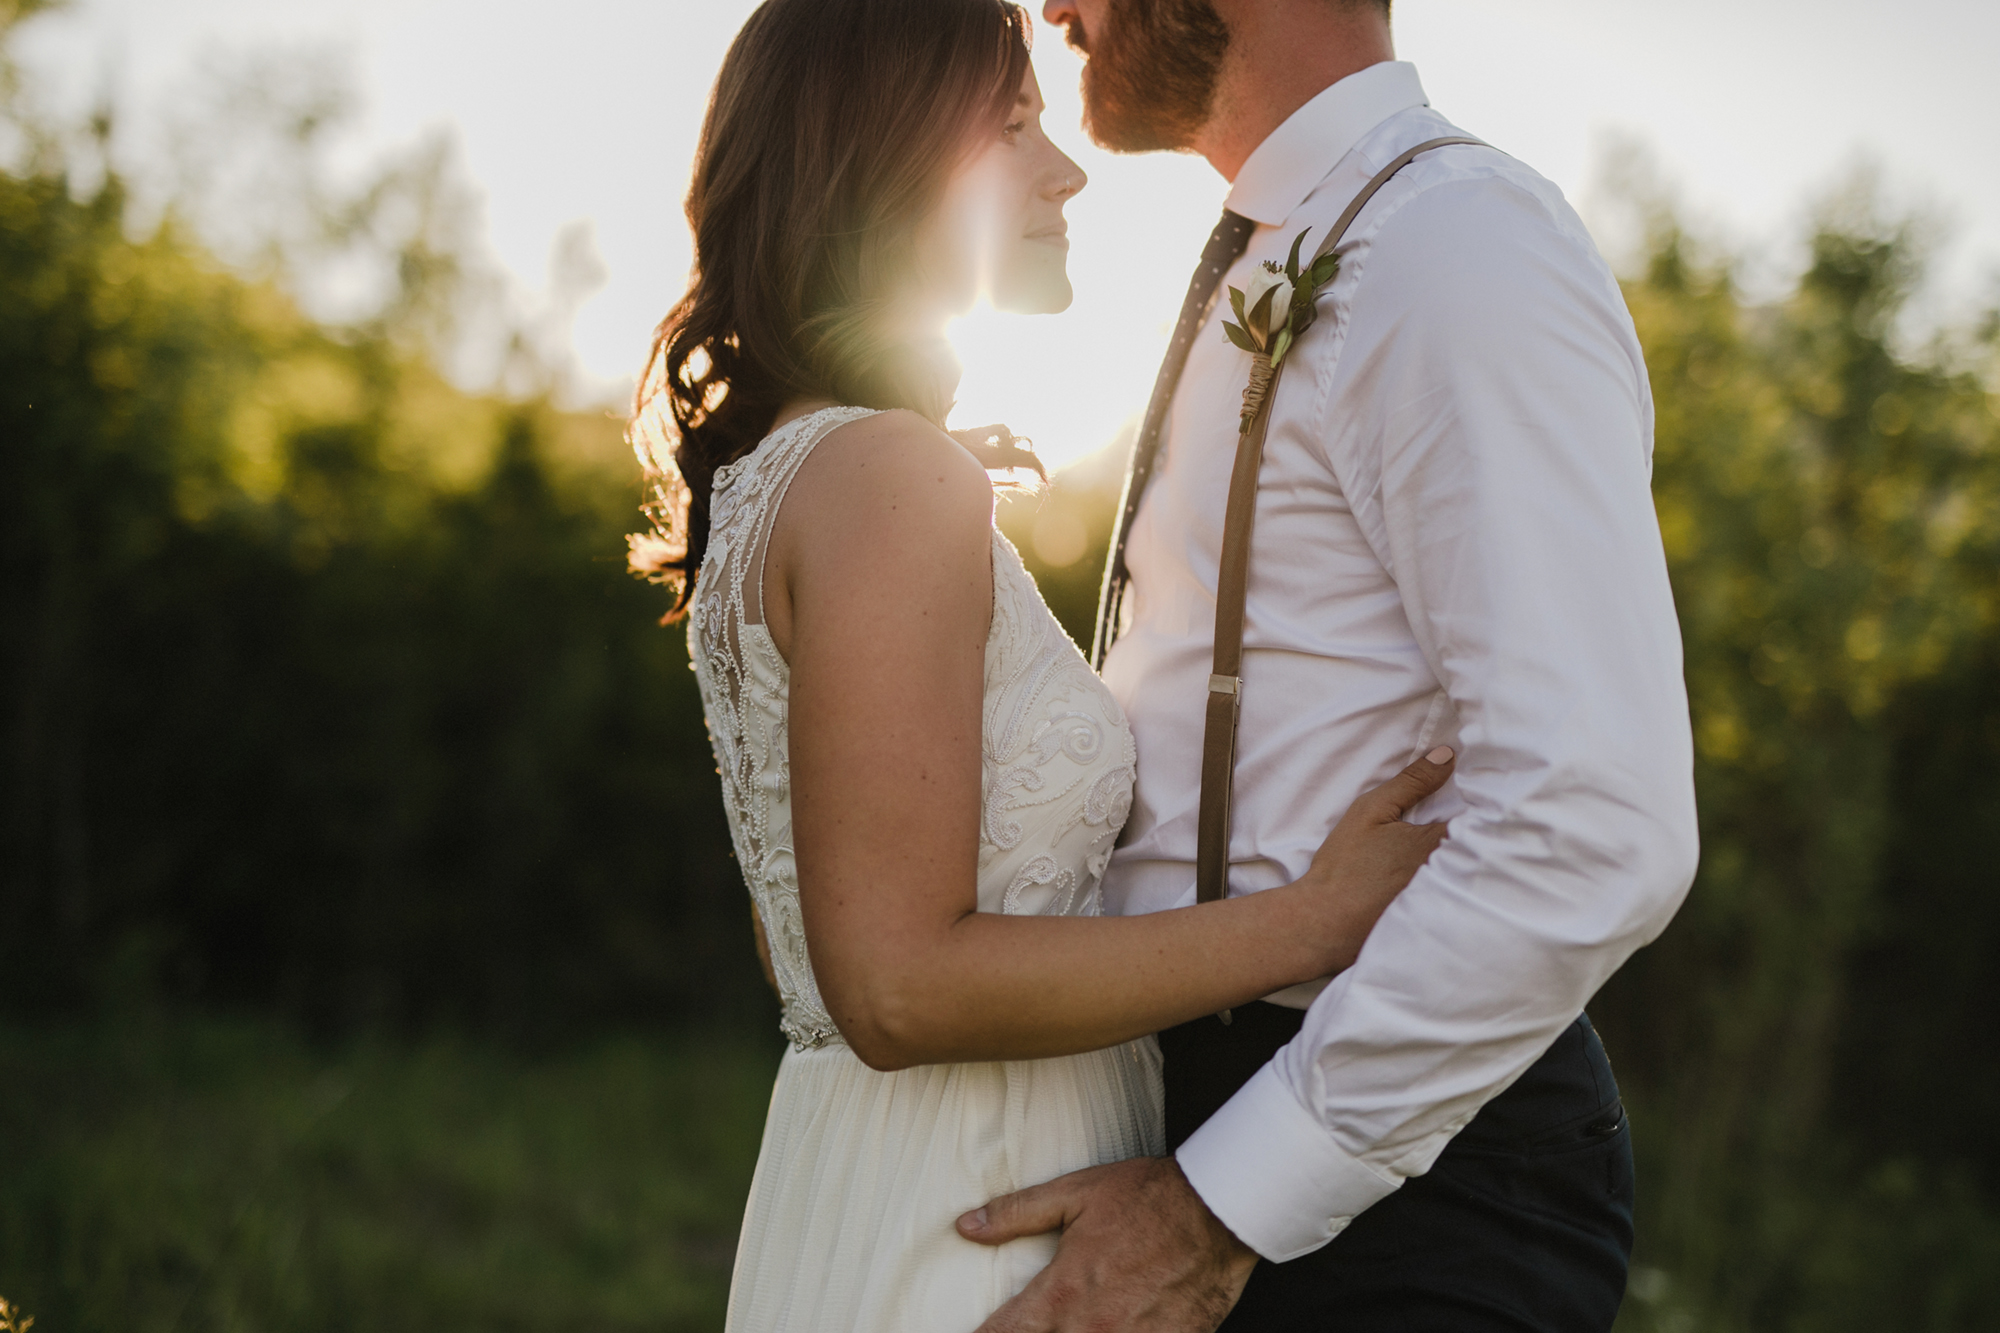 Flower Farm Crowsnest Pass Wedding -073.JPG